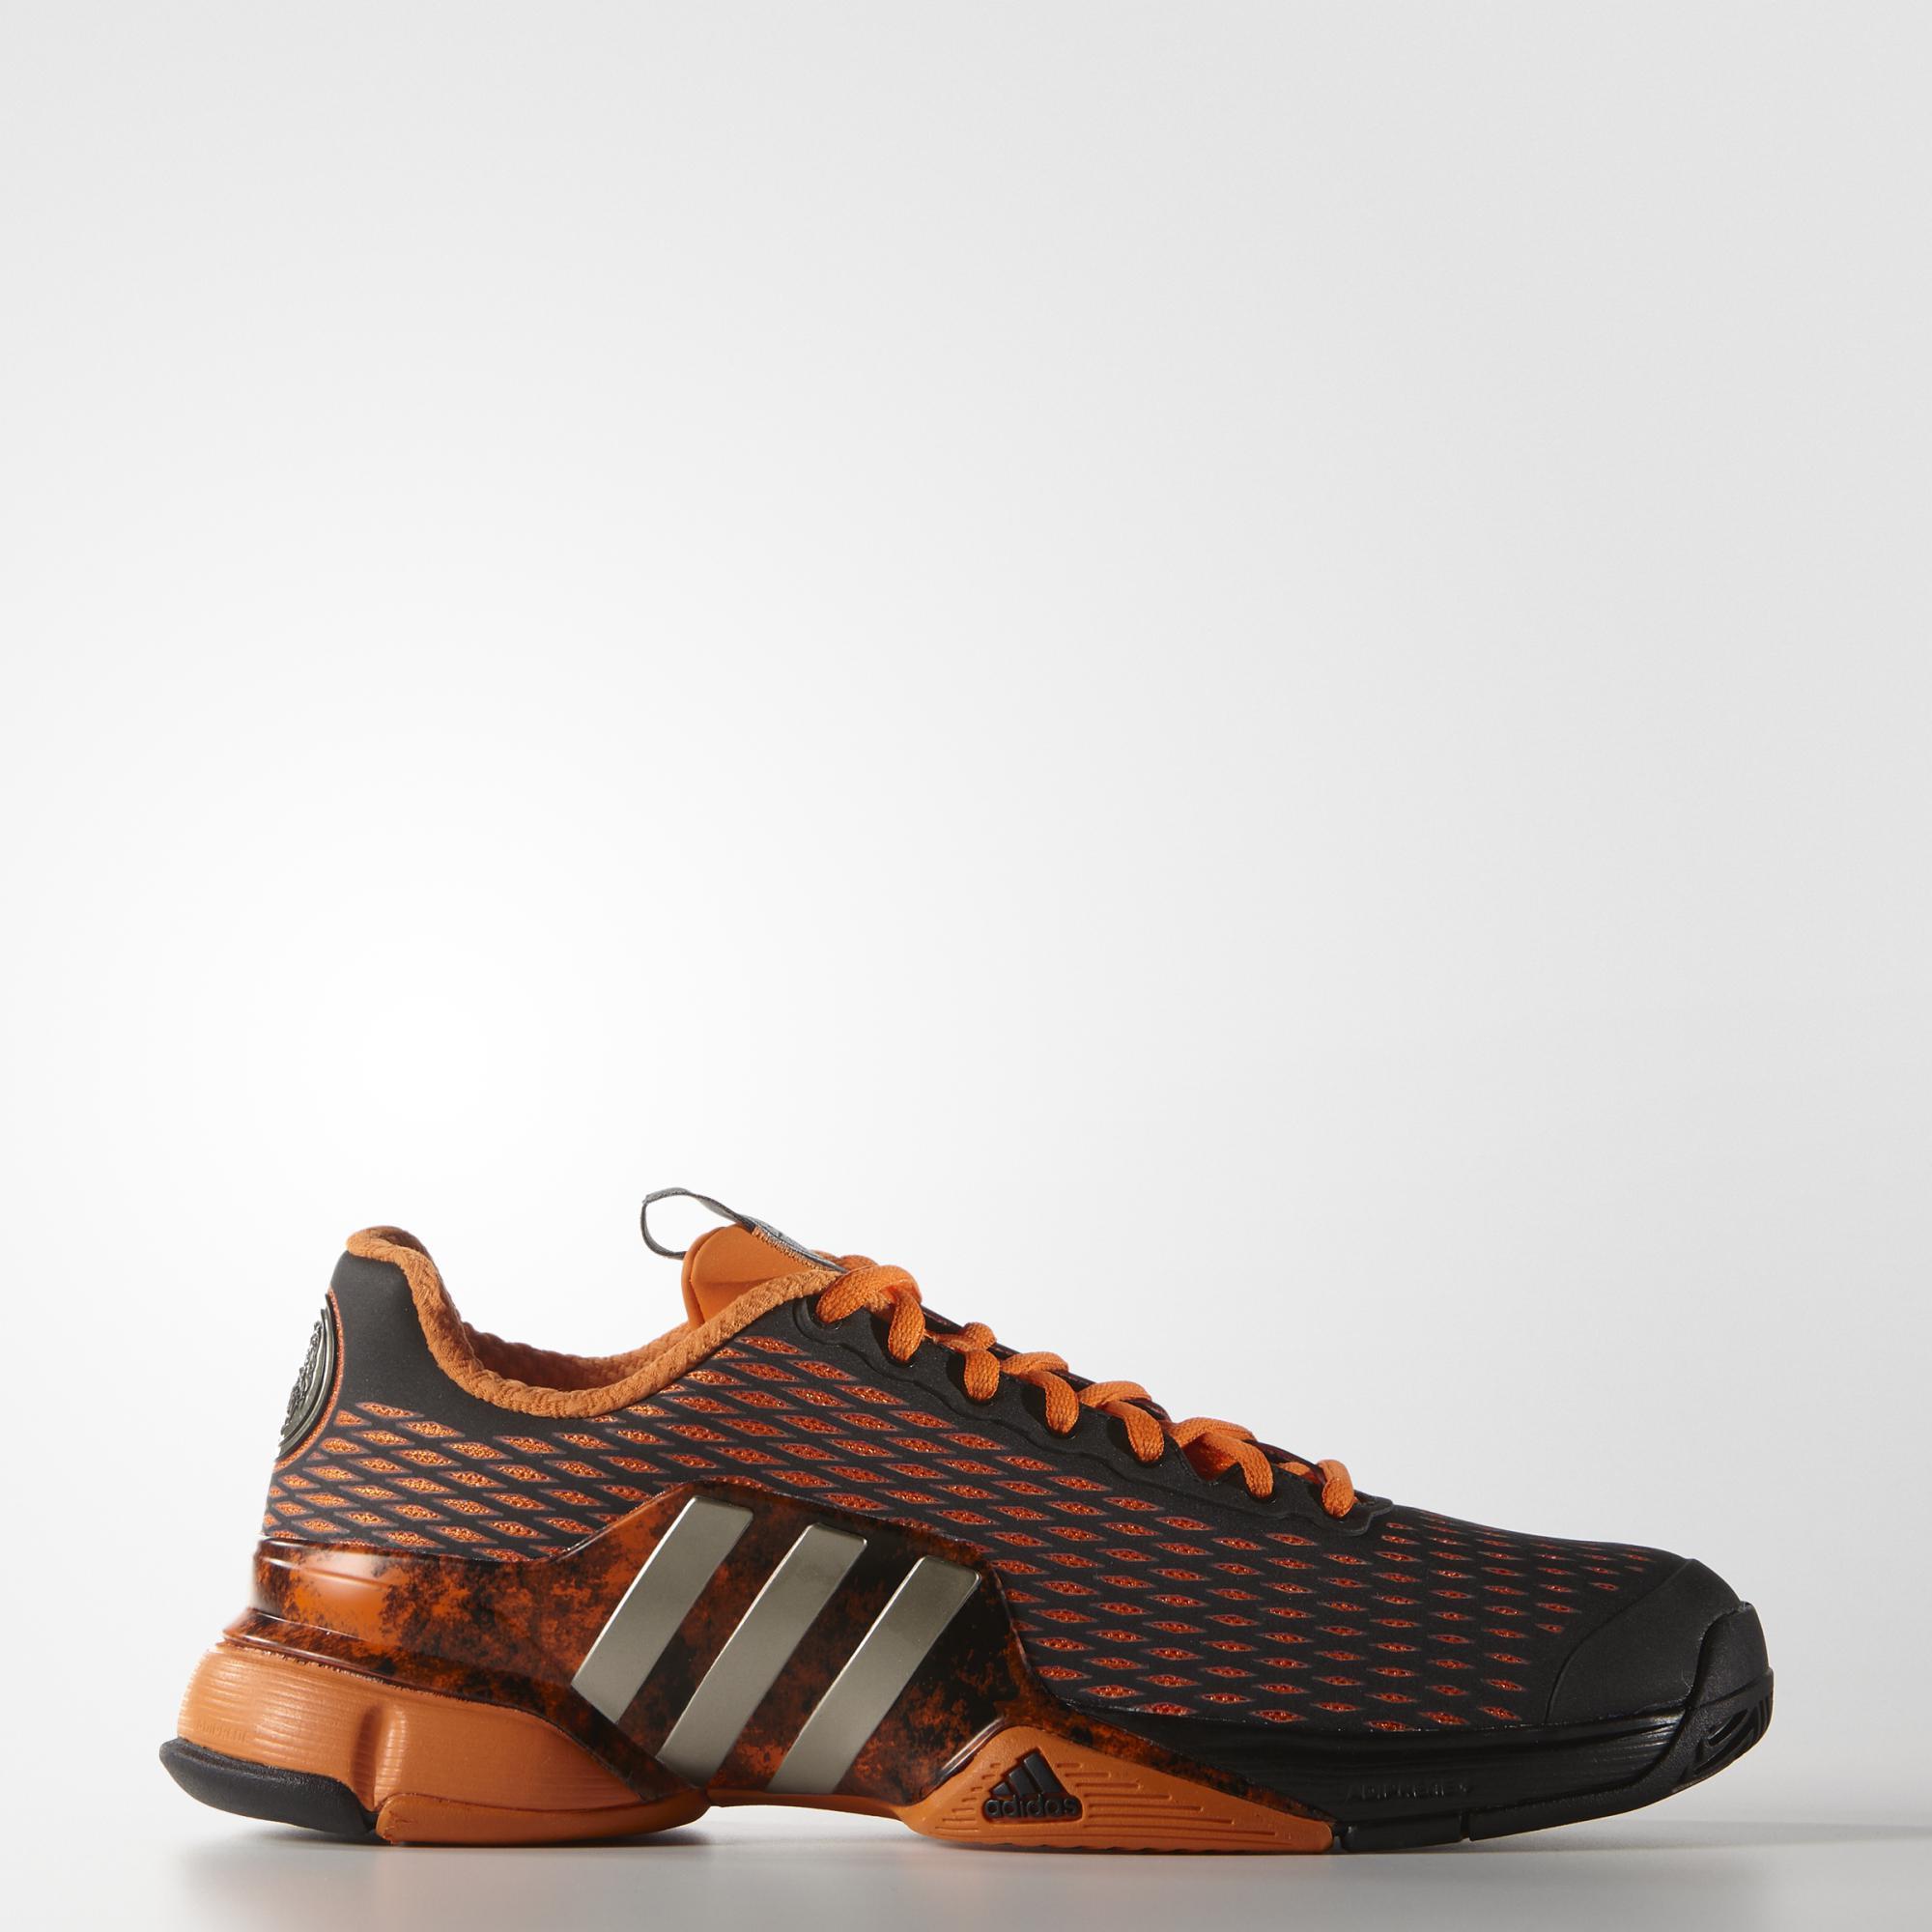 38888d217 Adidas Mens Barricade 2016 Alexander Tennis Shoes - Orange Black -  Tennisnuts.com